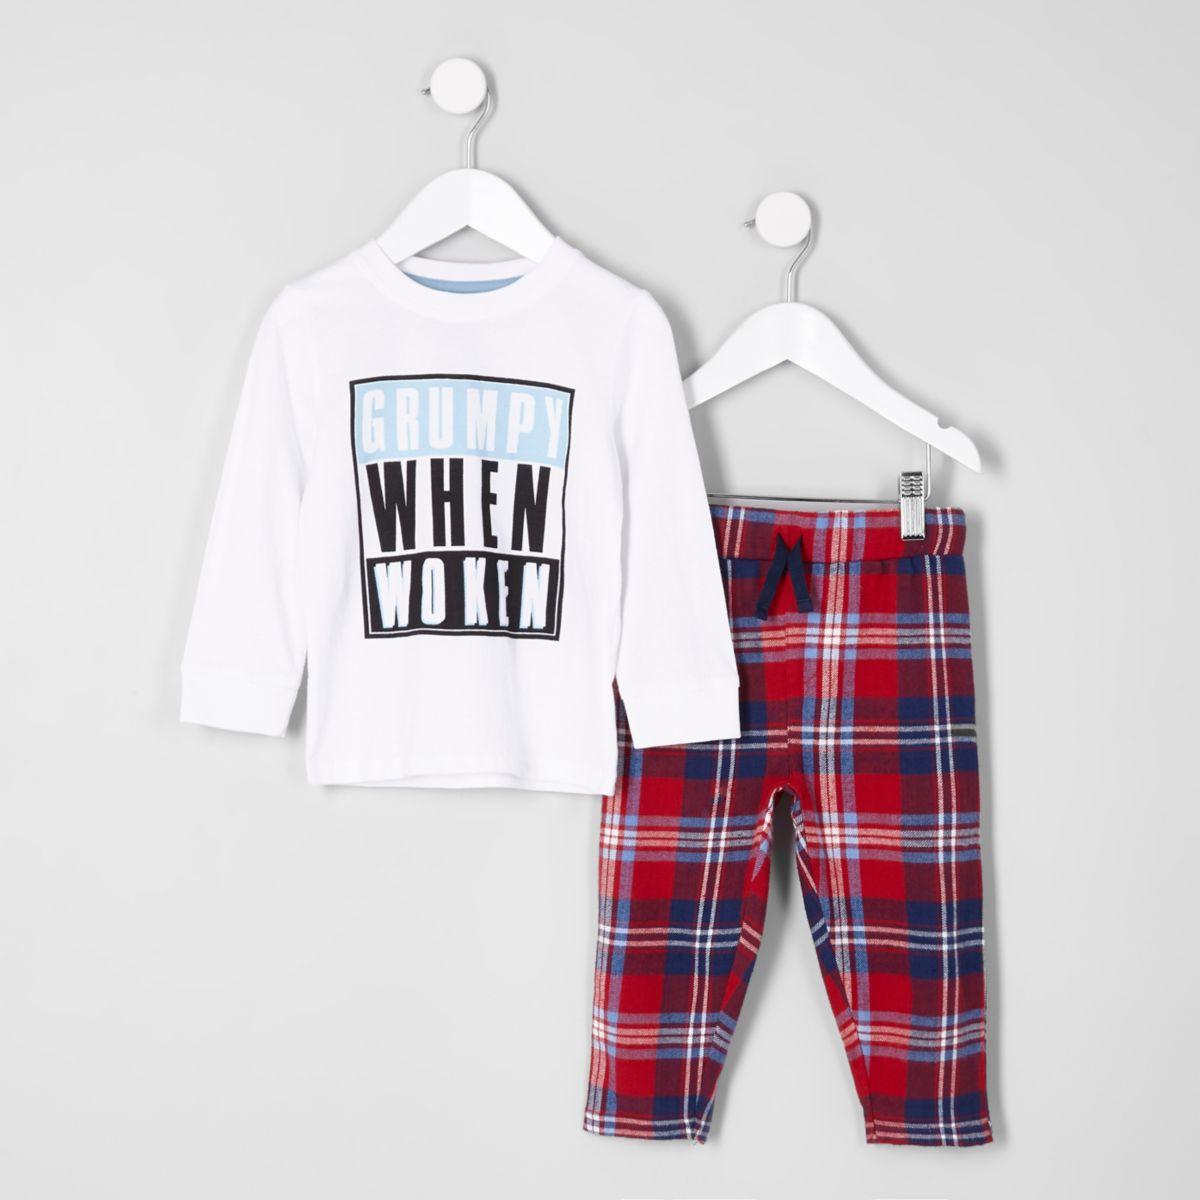 Mini boys 'grumpy when woken' pajama set